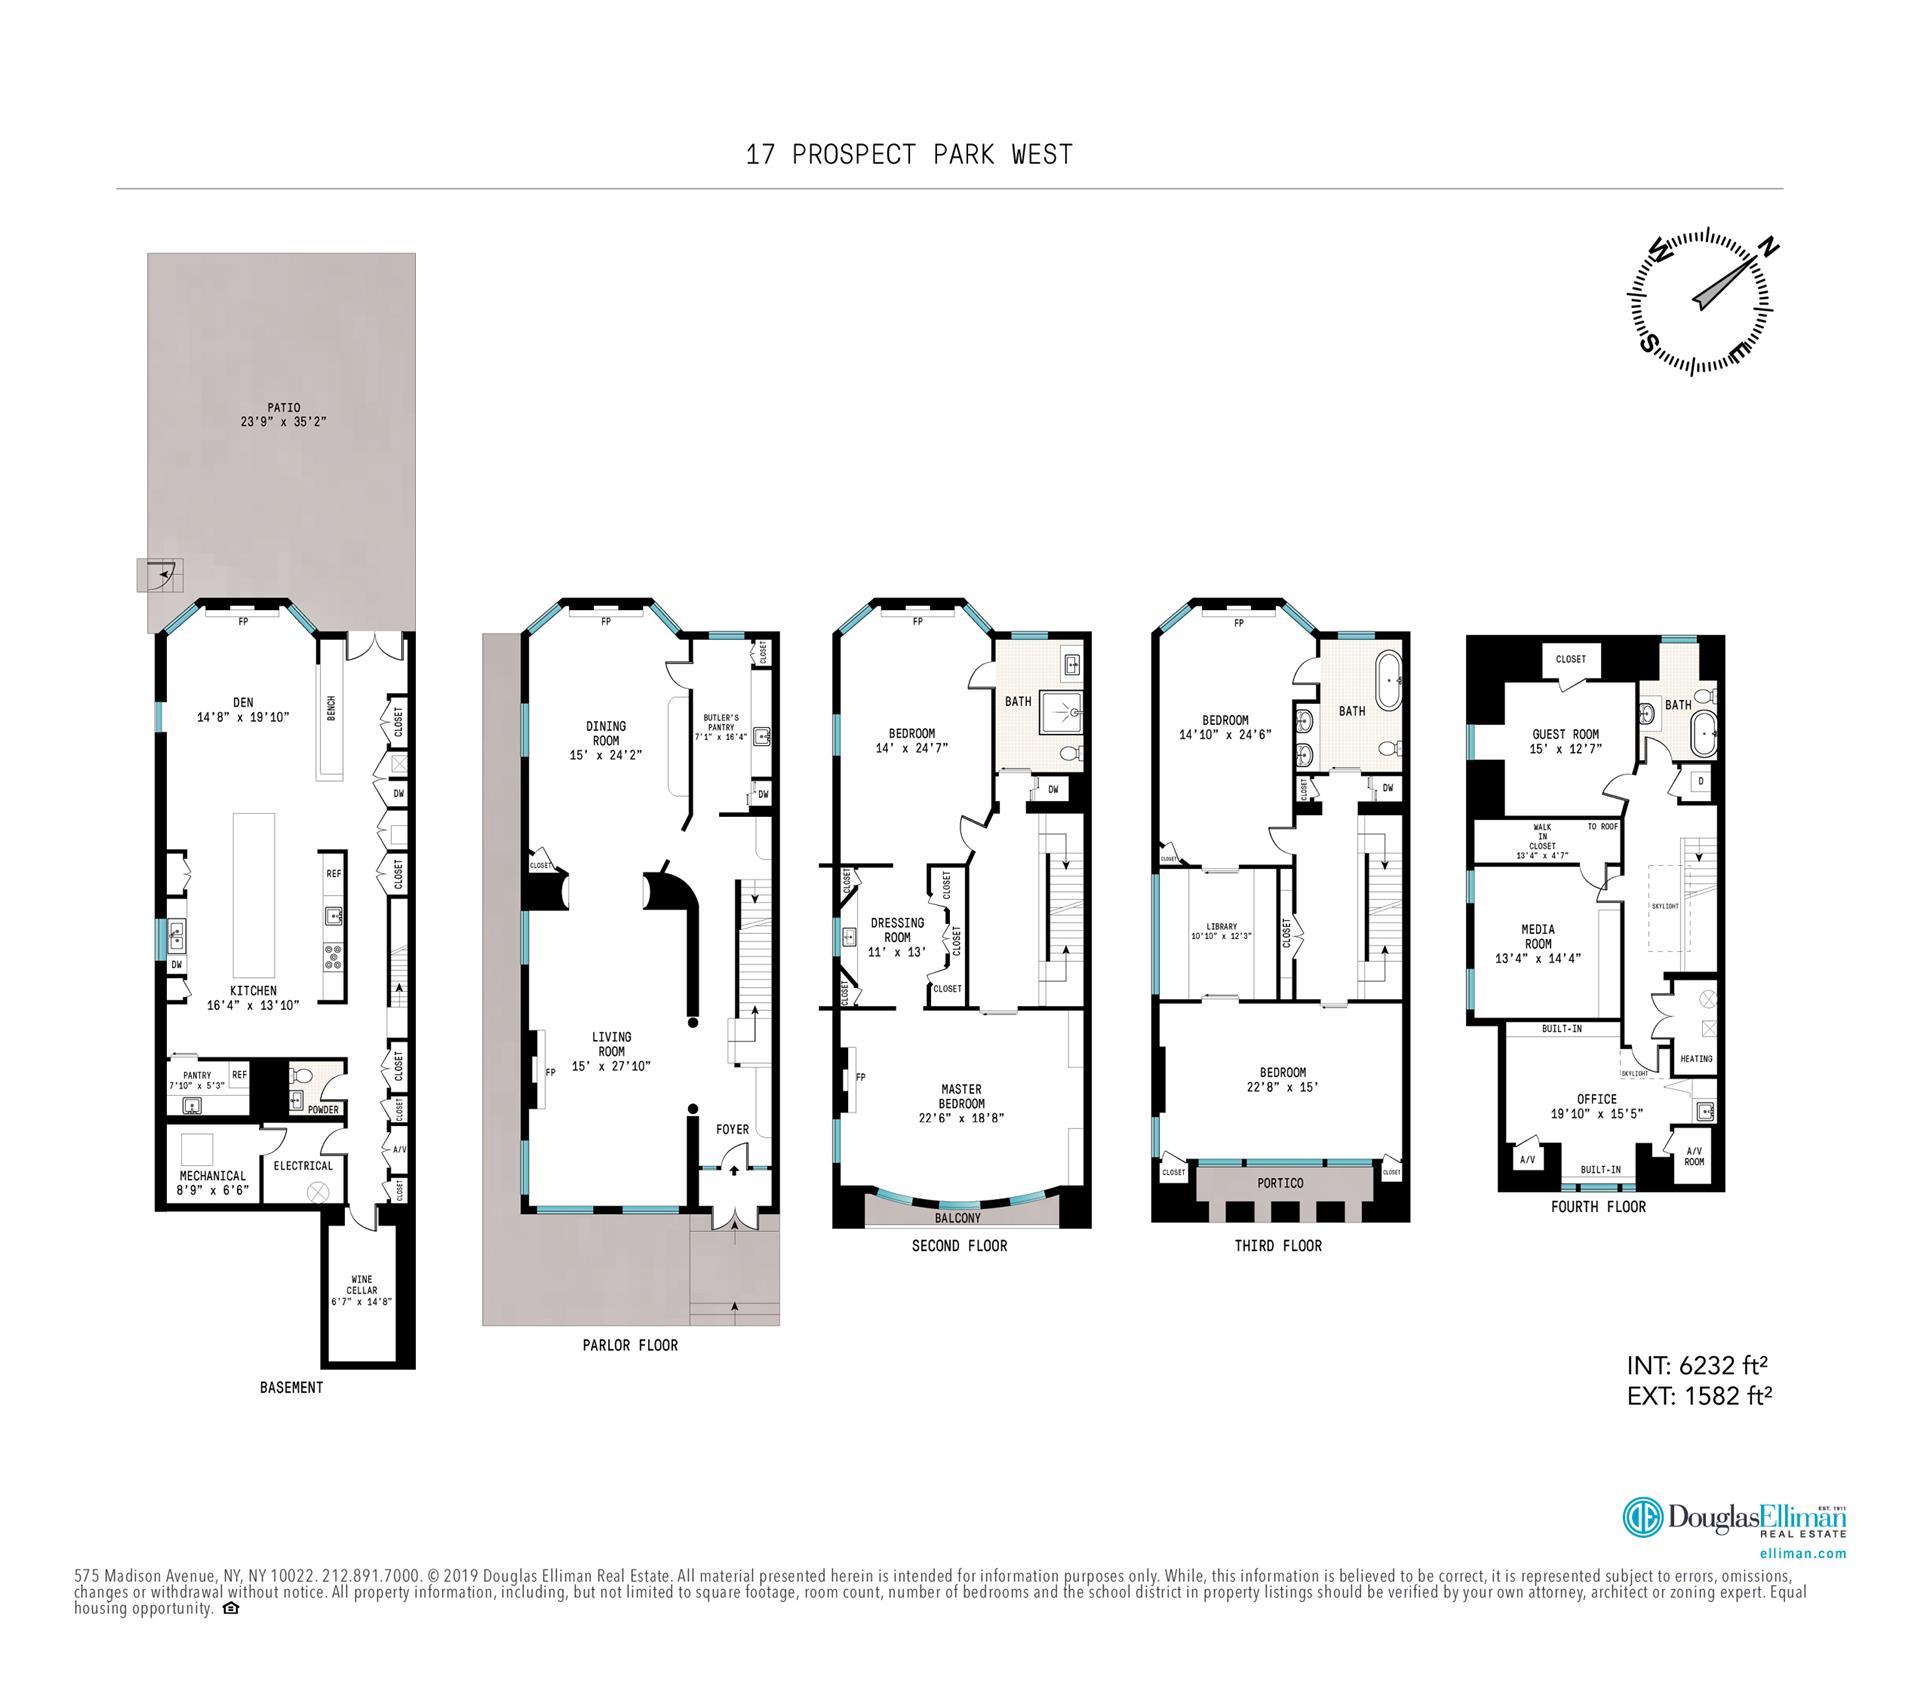 Floor plan of 17 Prospect Park West - Park Slope, New York